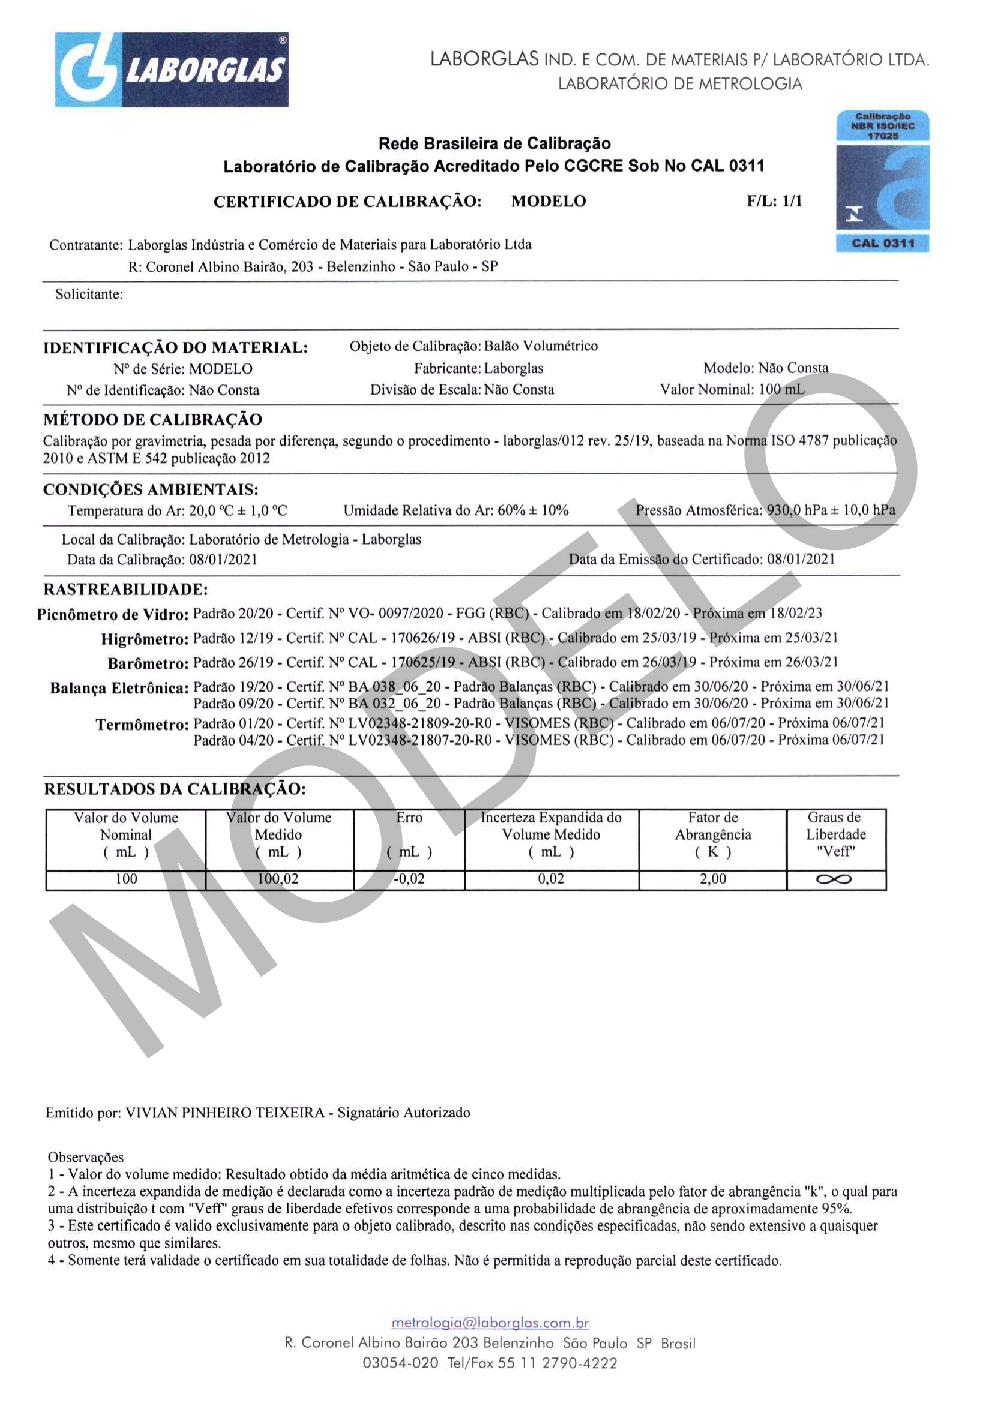 BALÃO VOLUMÉTRICO CLASSE A ROLHA POLI C/ CERTIFICADO RBC 25 ML - Marca Laborglas - Cód. 9167814-R